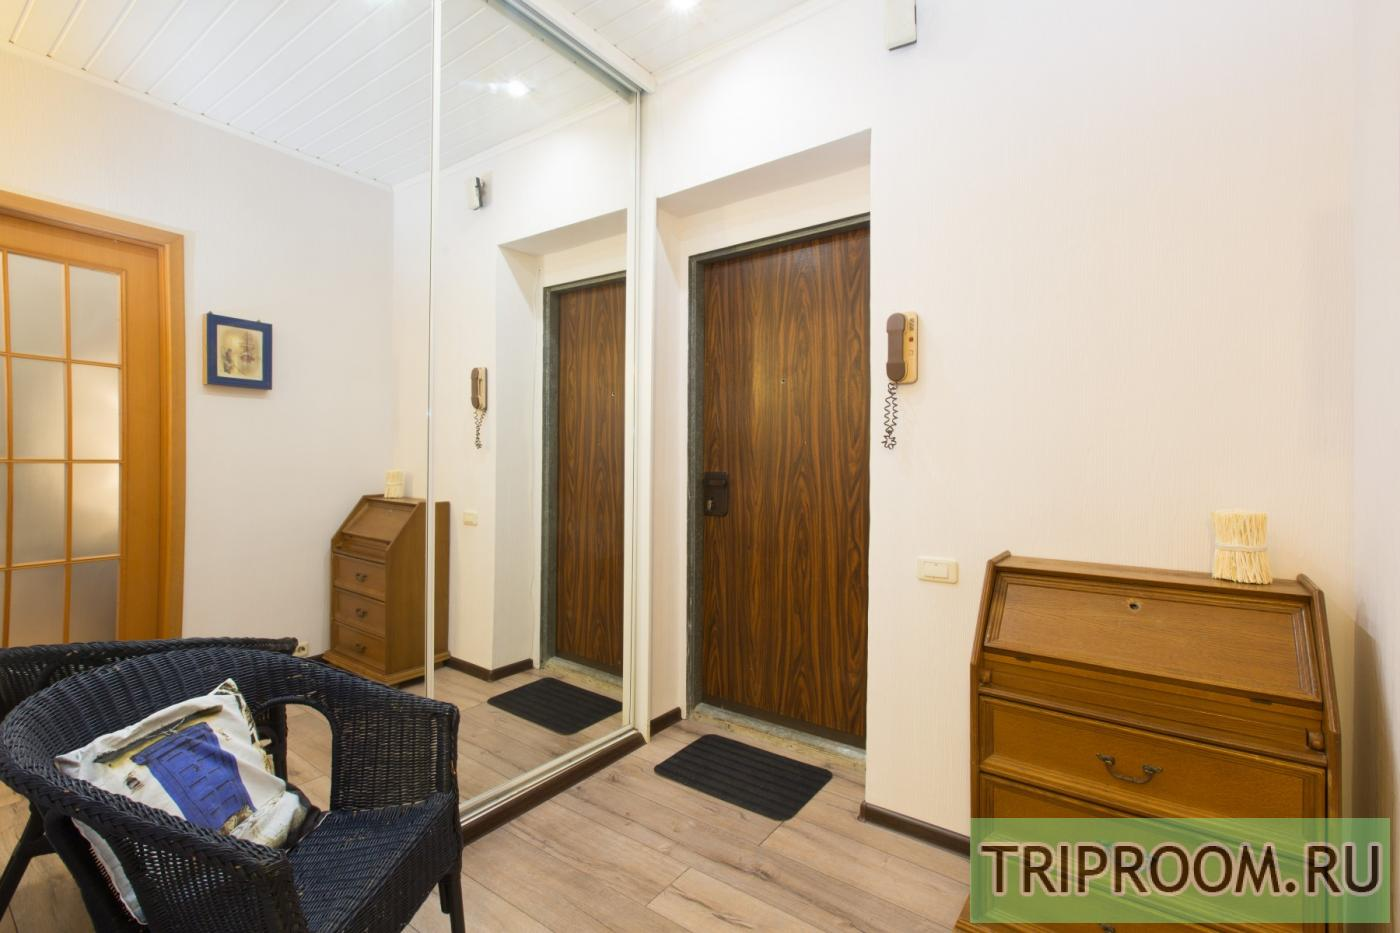 1-комнатная квартира посуточно (вариант № 34591), ул. Карманицкий переулок, фото № 7